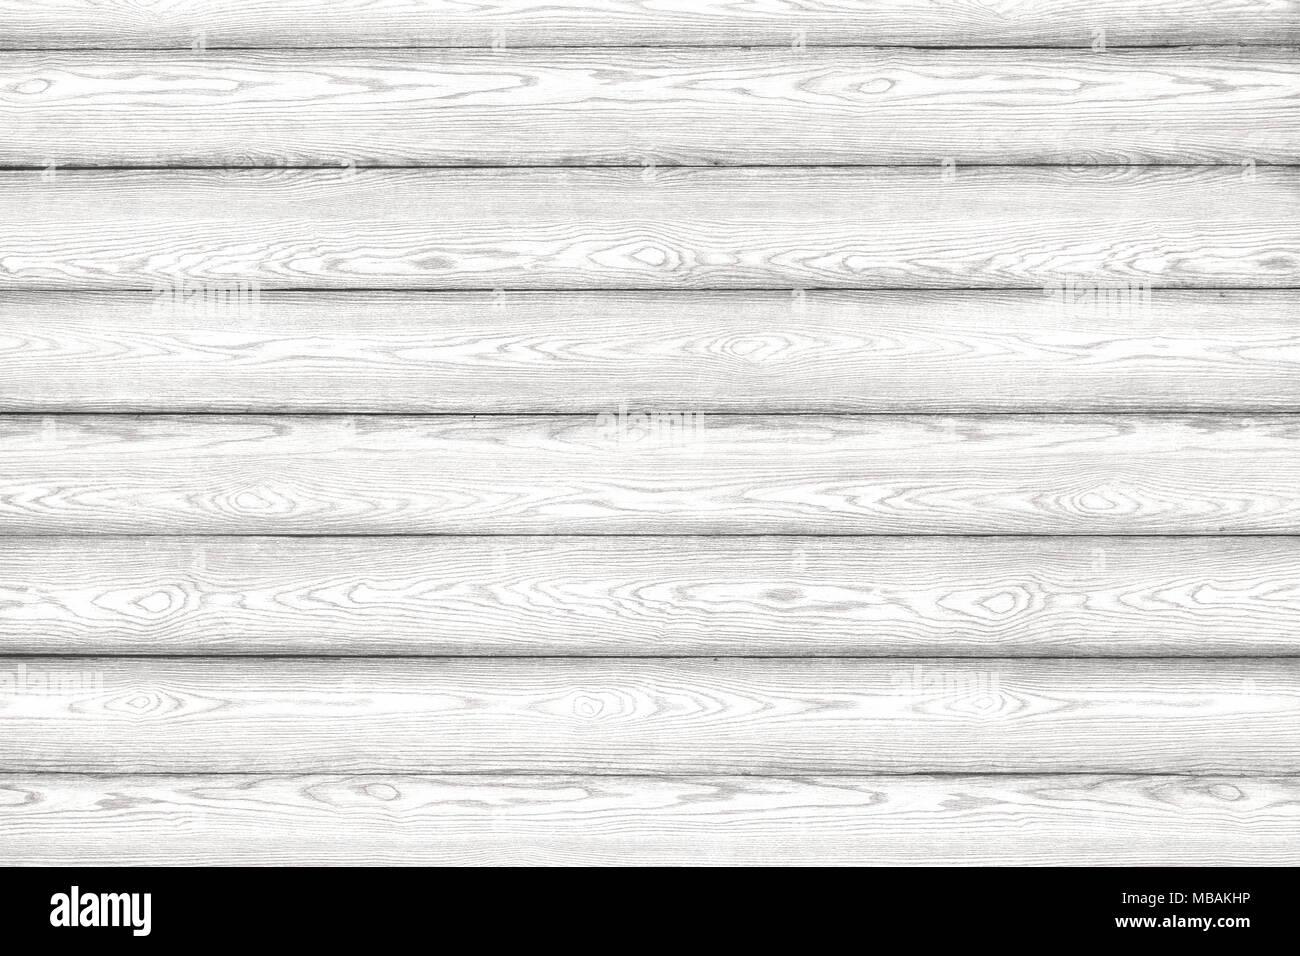 Legno Bianco Texture : Legno bianco texture di sfondo foto royalty free immagini